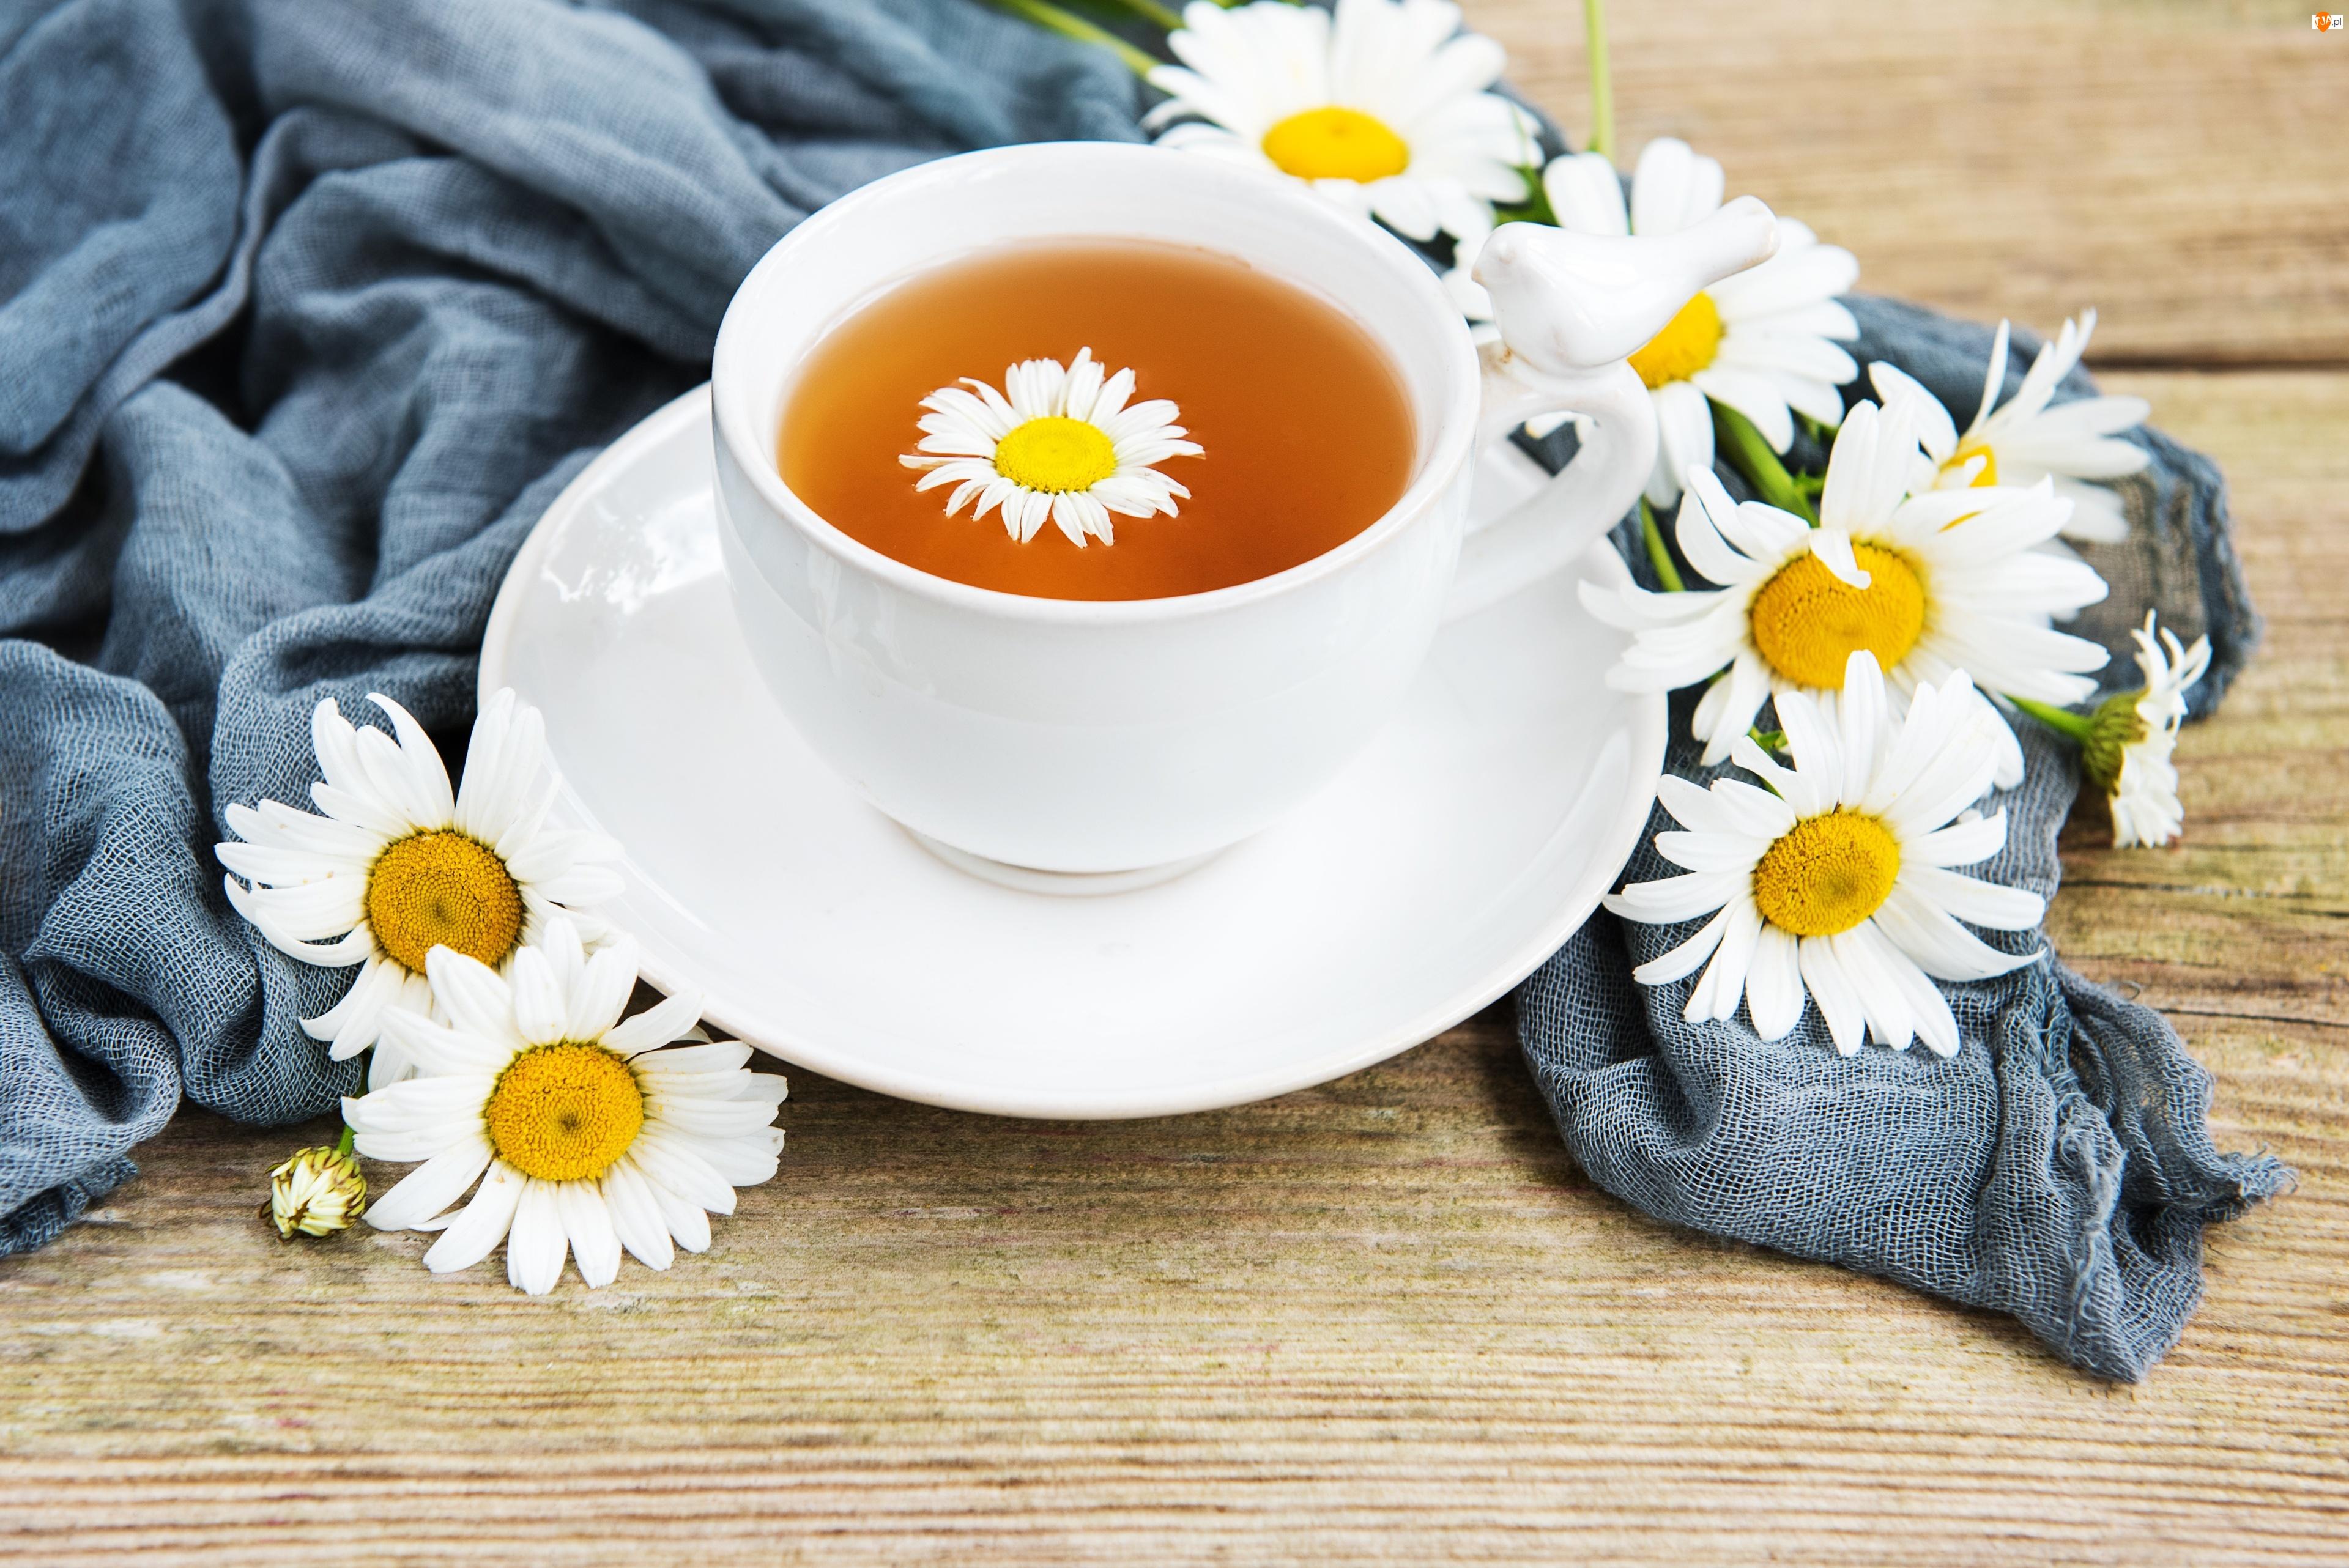 Filiżanka, Kwiaty, Rumianek, Herbata